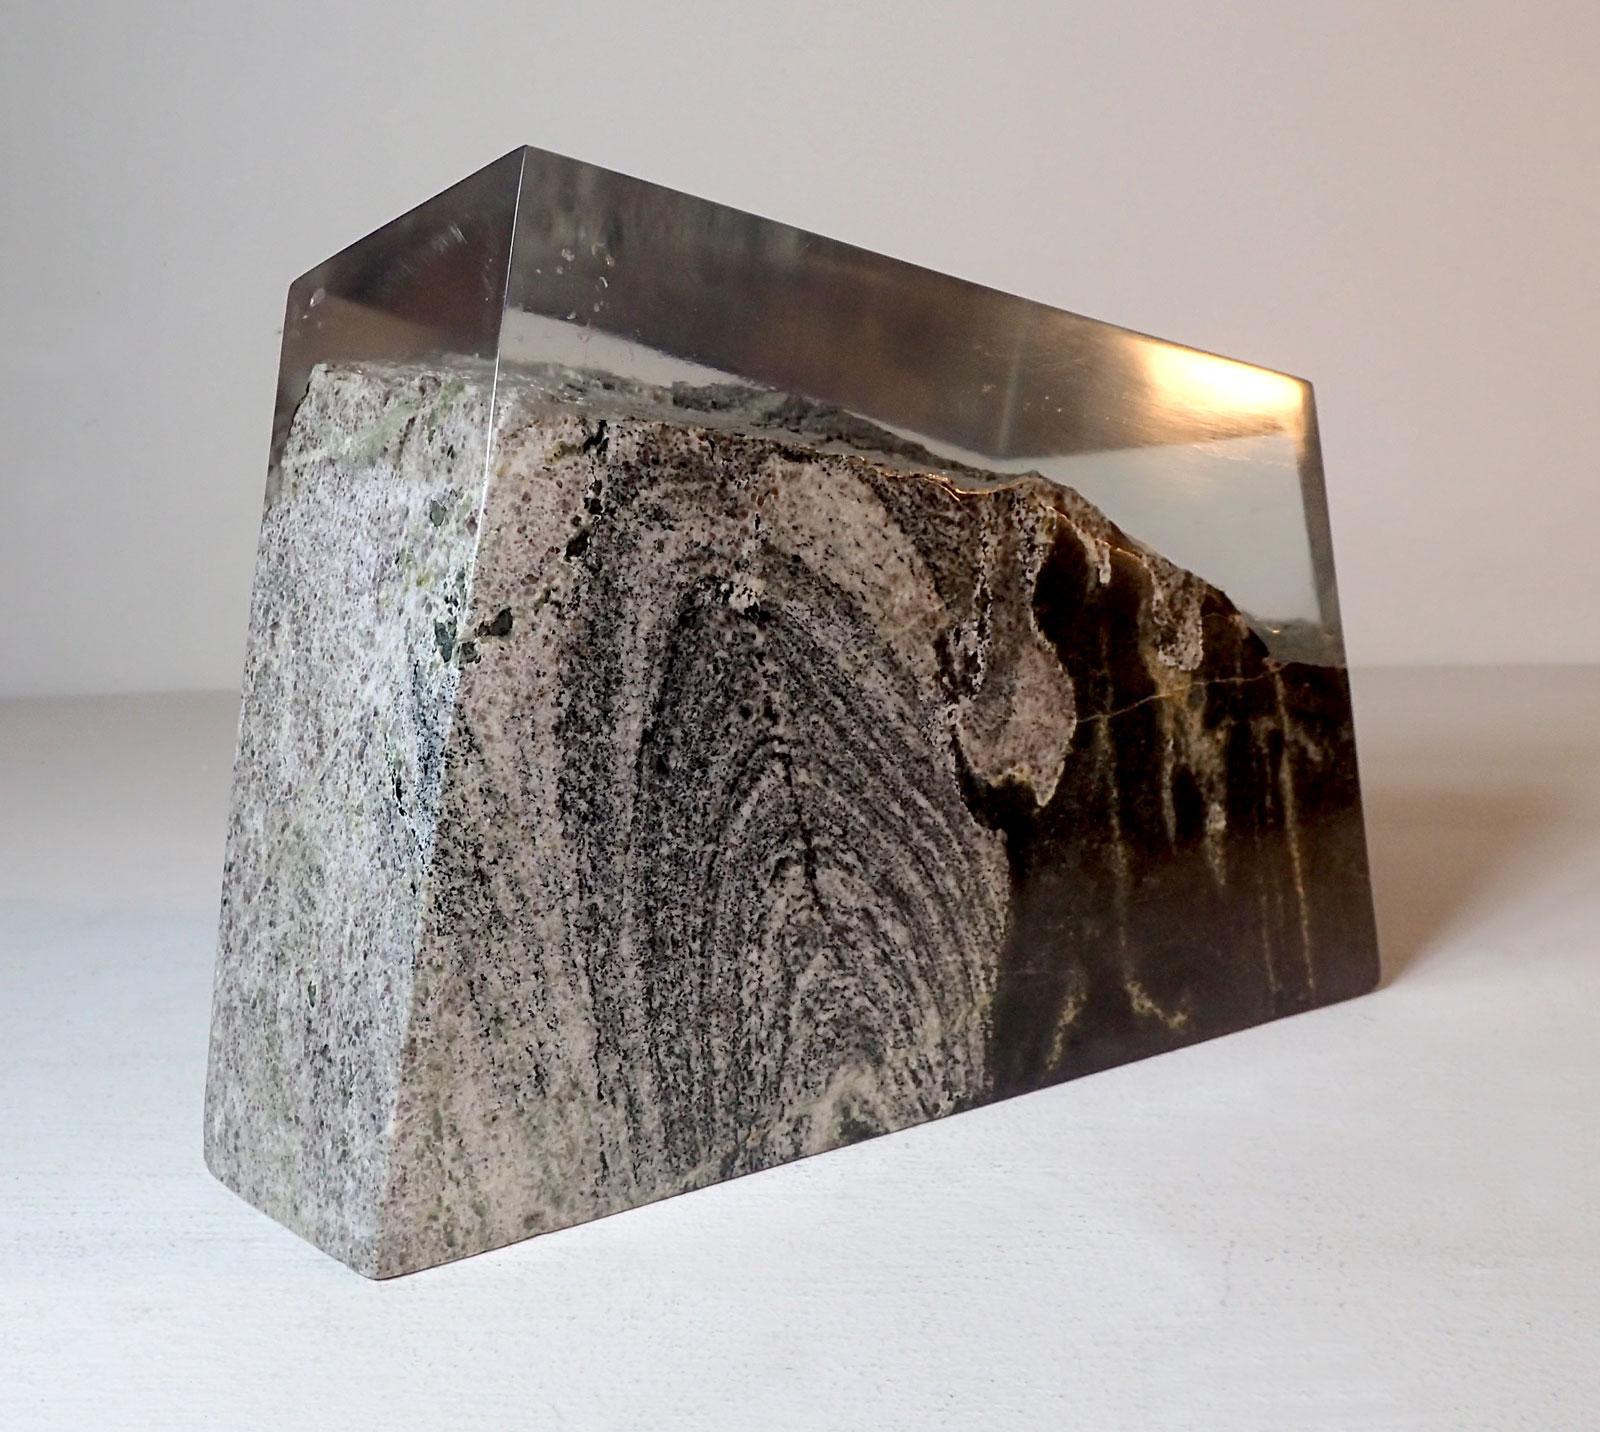 Fluid-Rock - 2017, Lewisian gneiss and acrylic, 23 x 38 x 24 cm - 15 kg. £1950